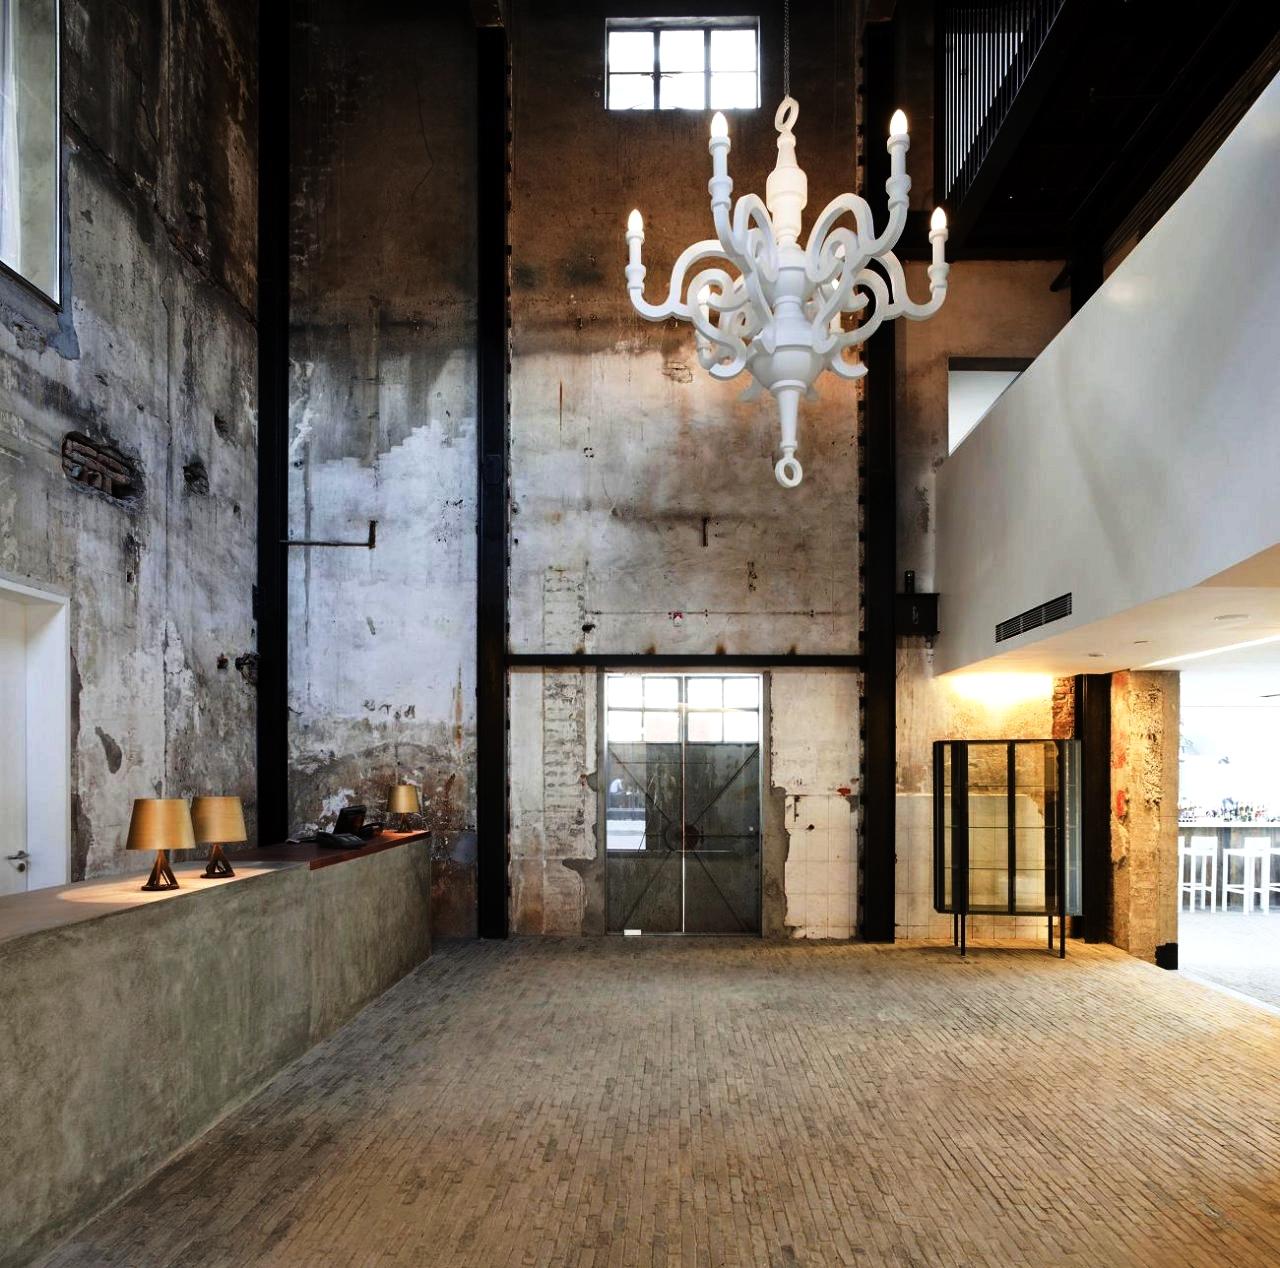 SLEEP_  THE WATERHOUSE.  #Iconic #Waterhouse #Industrial #Design   https://www.waterhouseshanghai.com